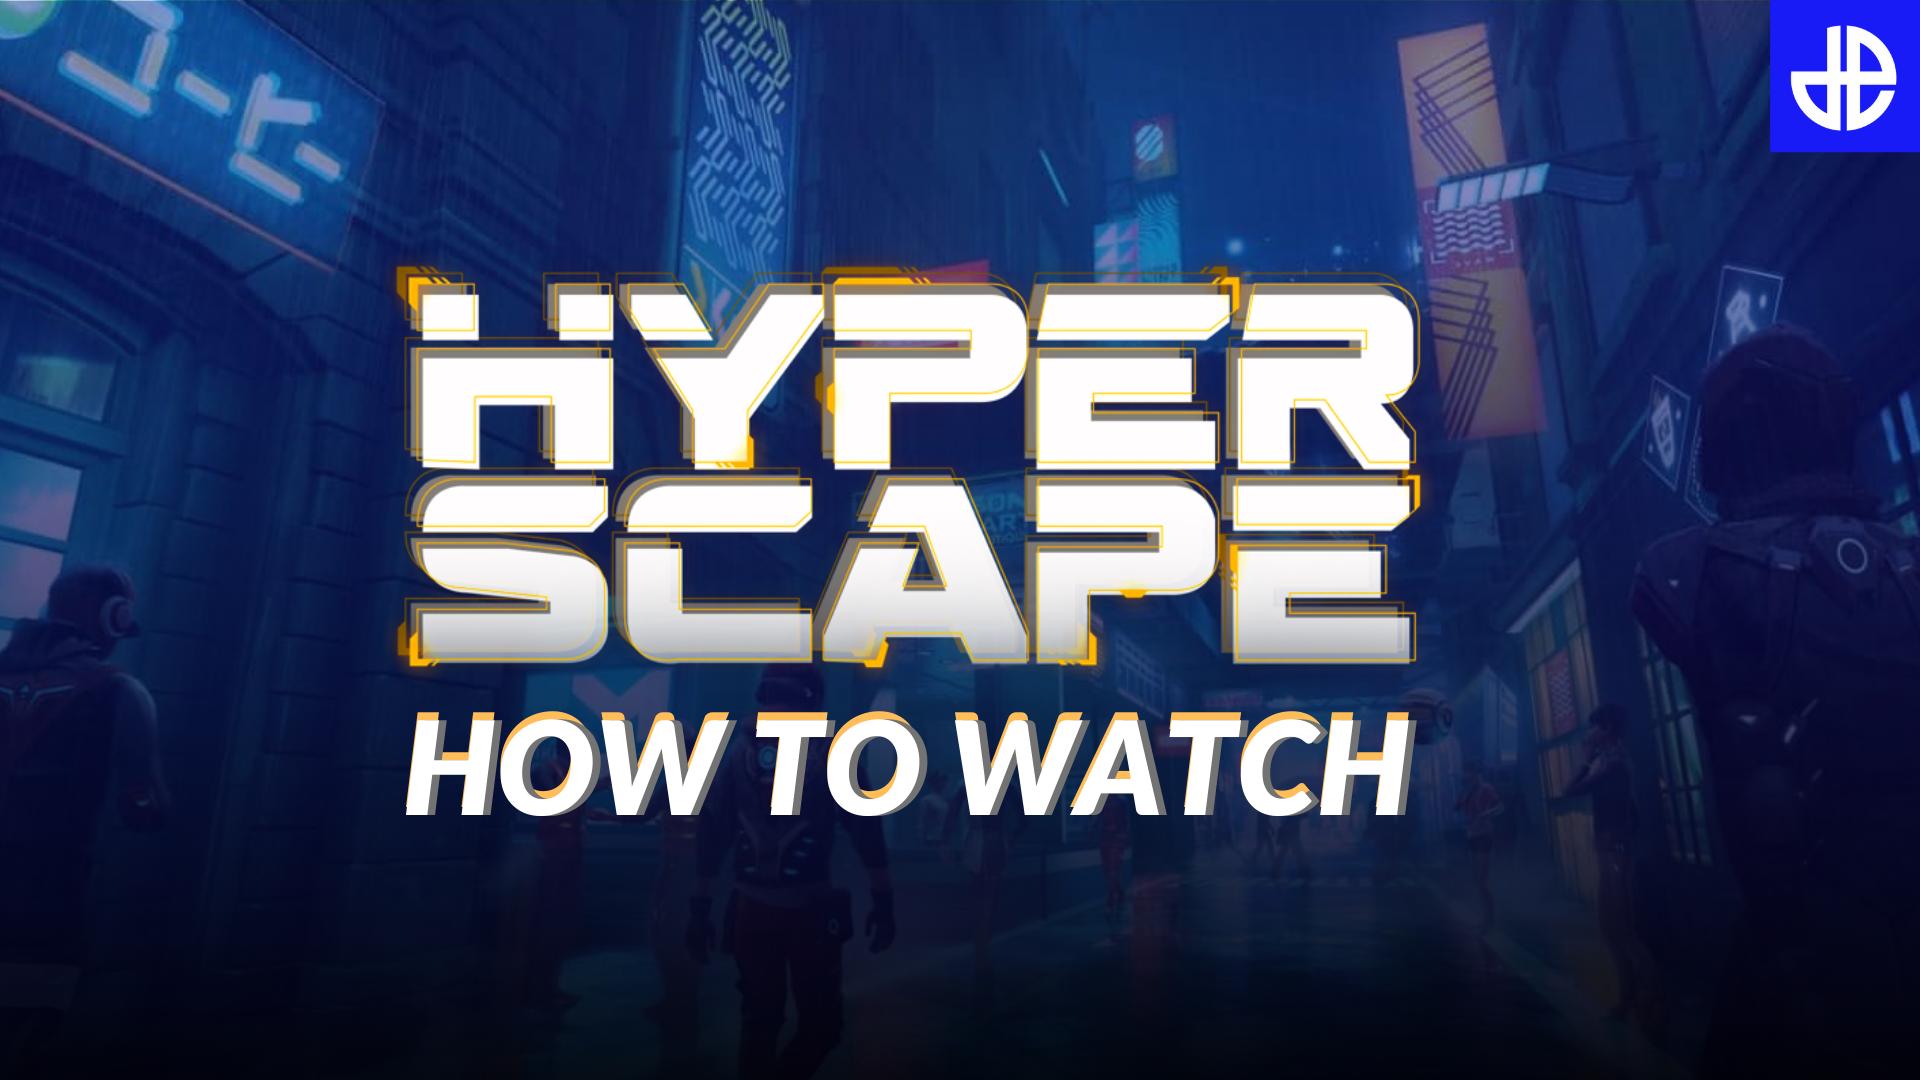 Hyper Scape reveal stream image